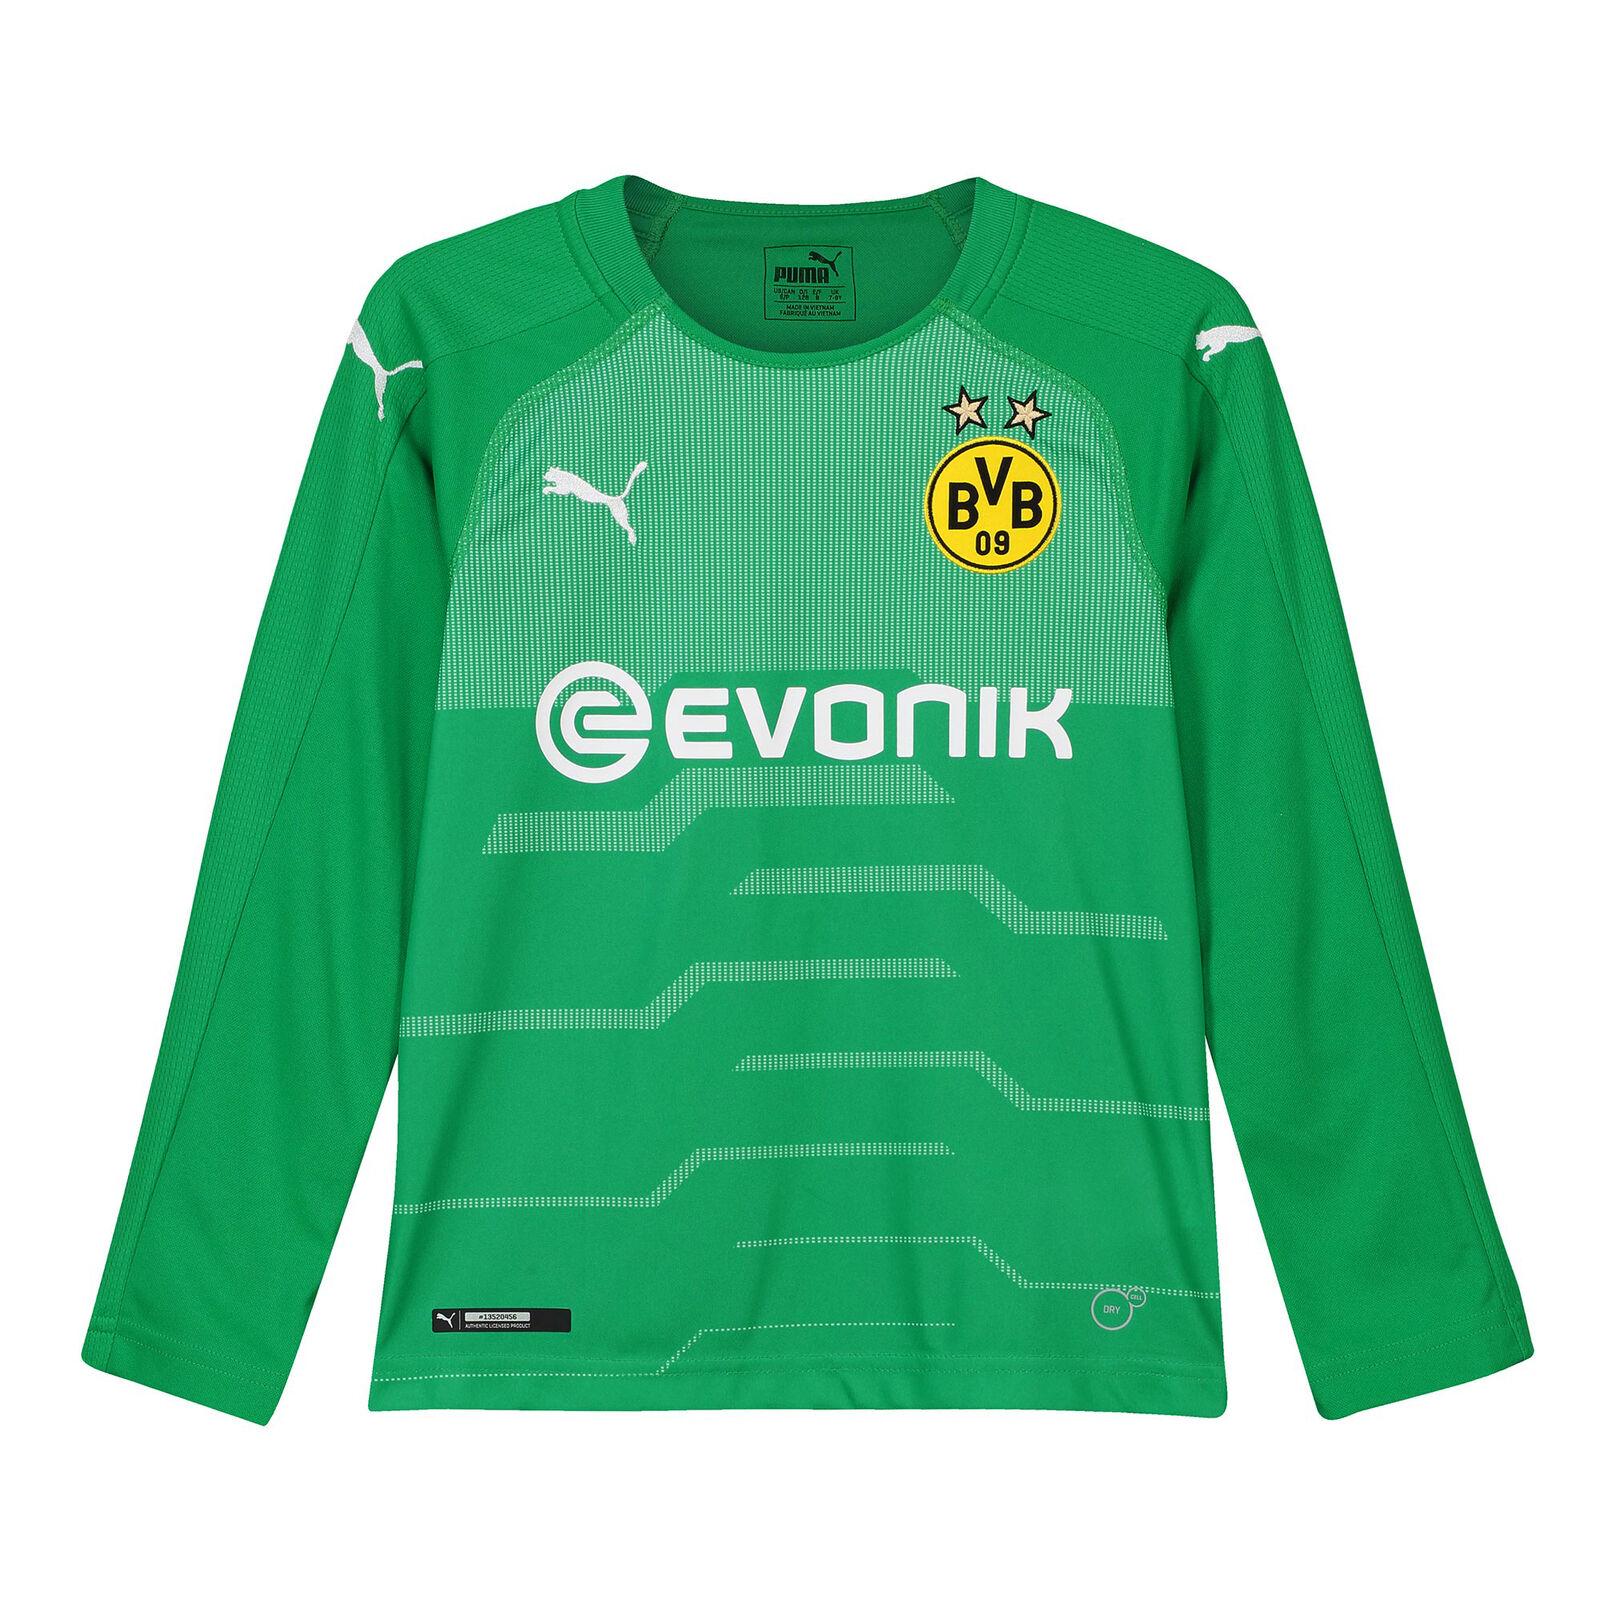 BVB Borussia 2018-19 Dortmund Offiziell Auswärts Torwart Shirt Hemd 2018-19 Borussia Kinder Puma 25ddd8